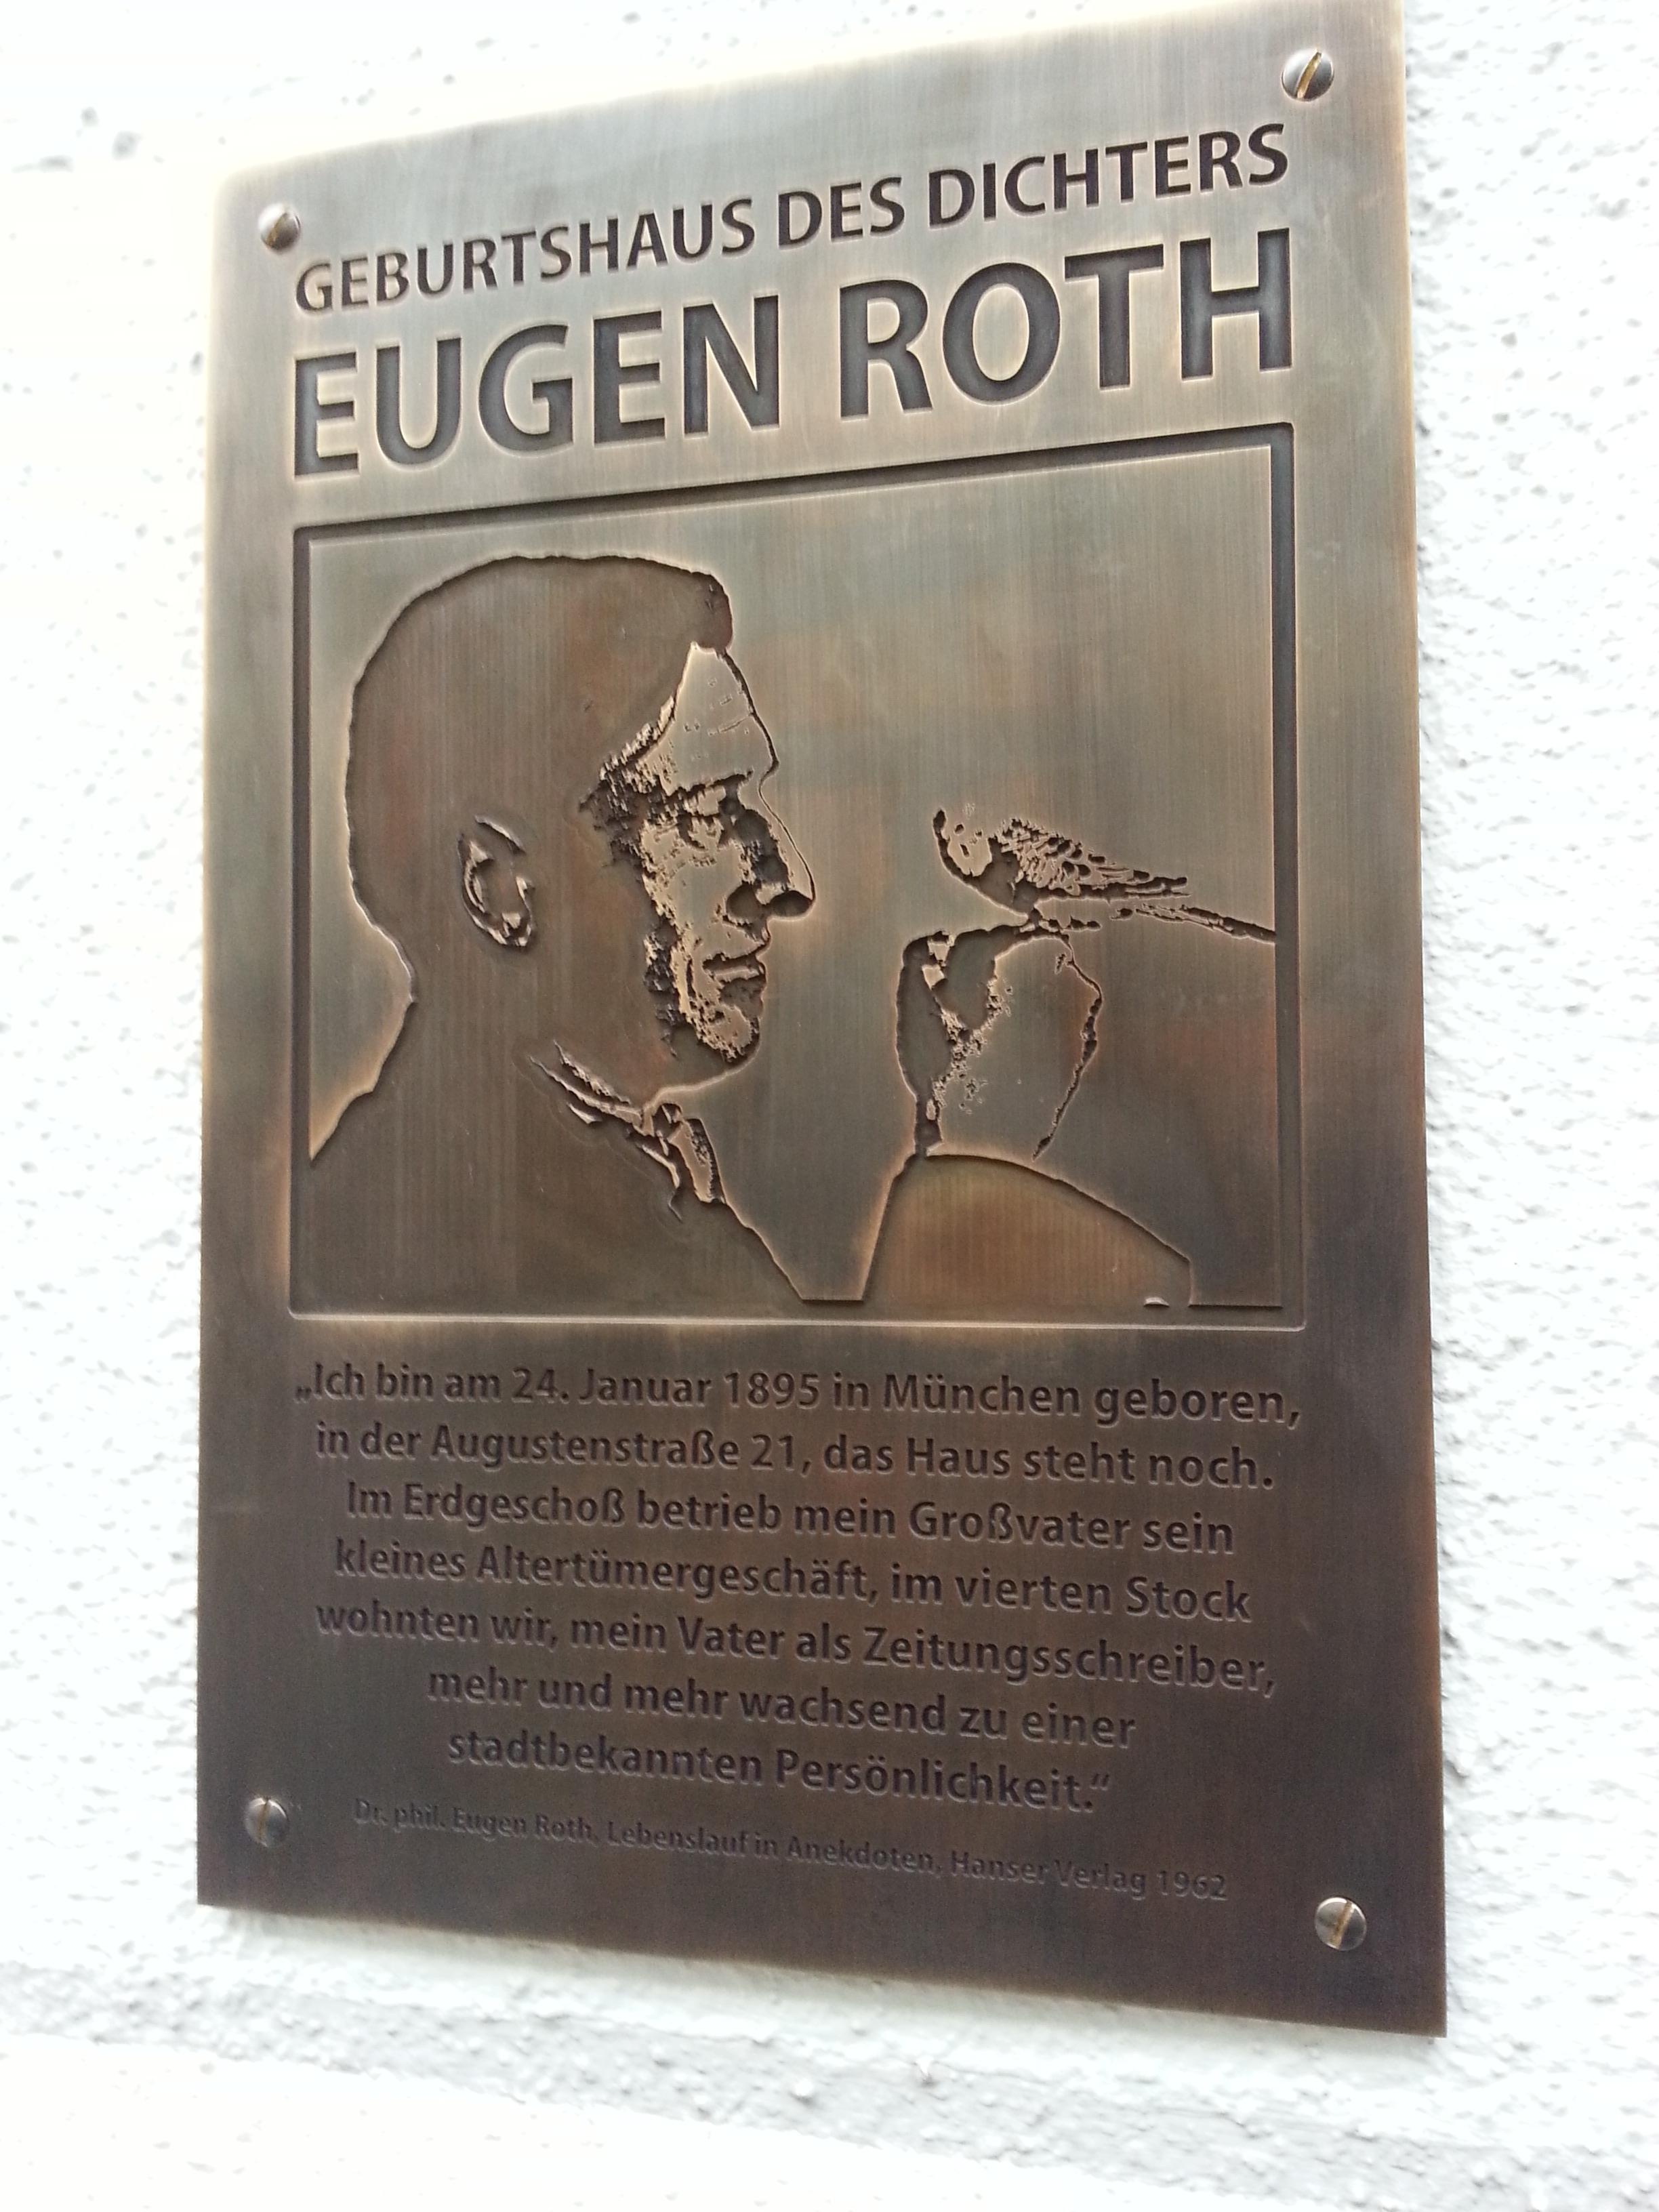 [[Memorial plaque